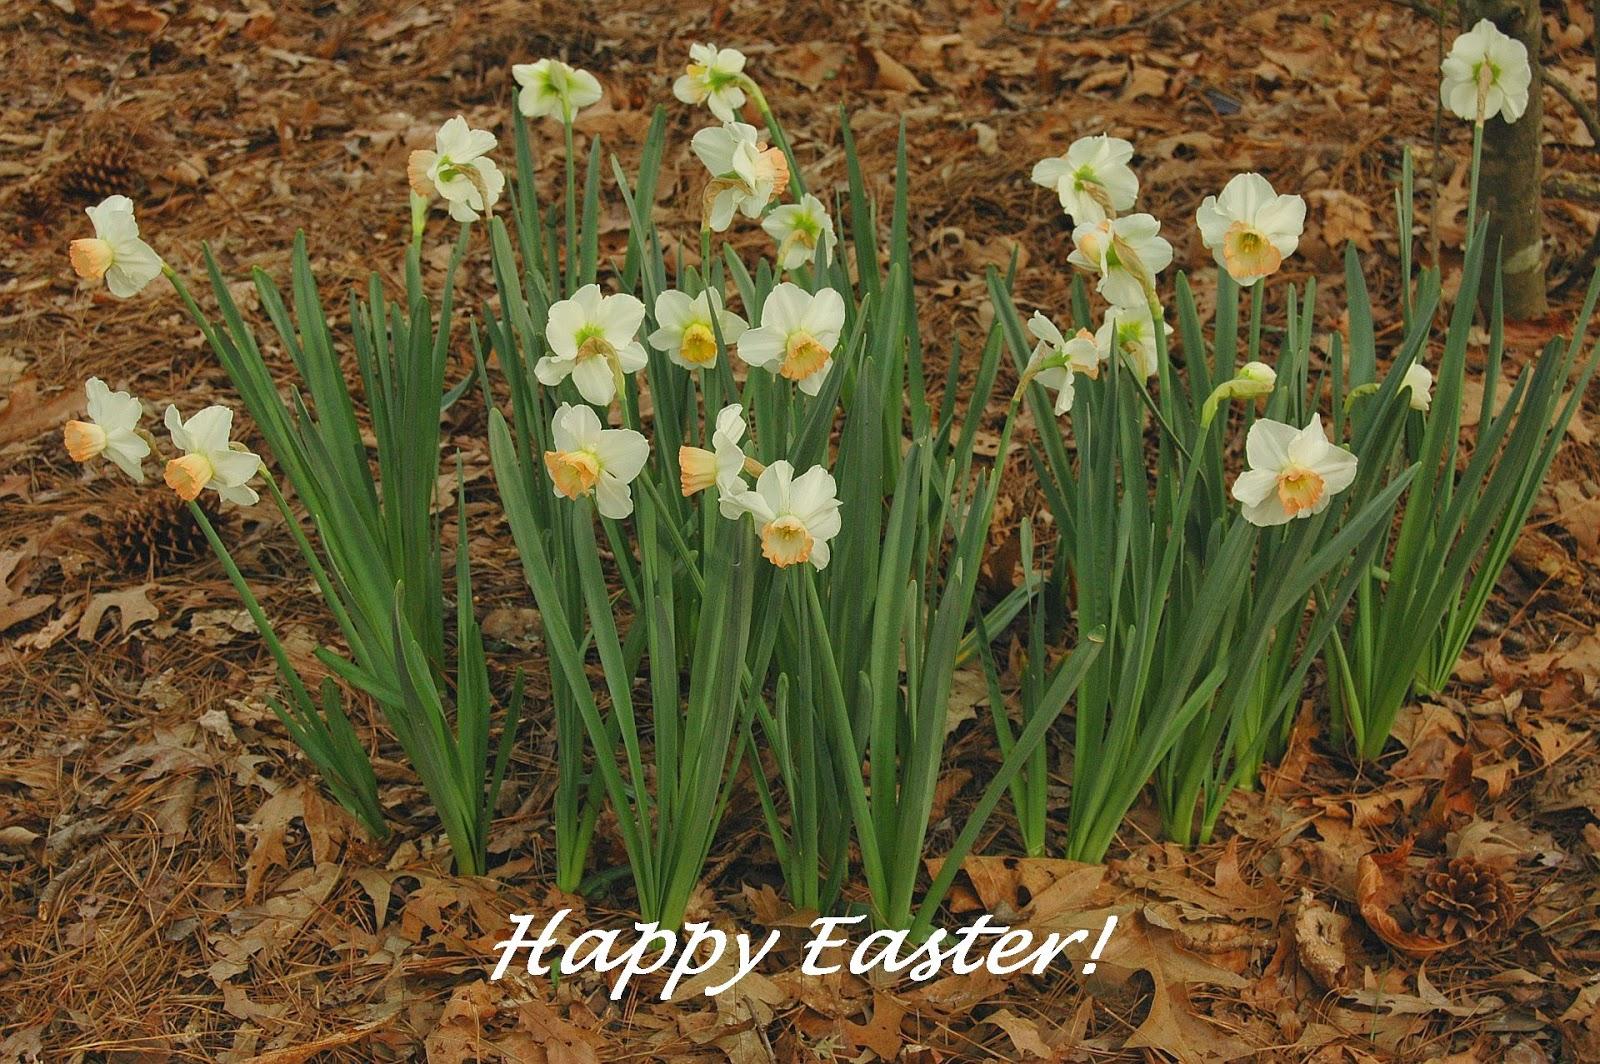 Happy Easter Daffodils